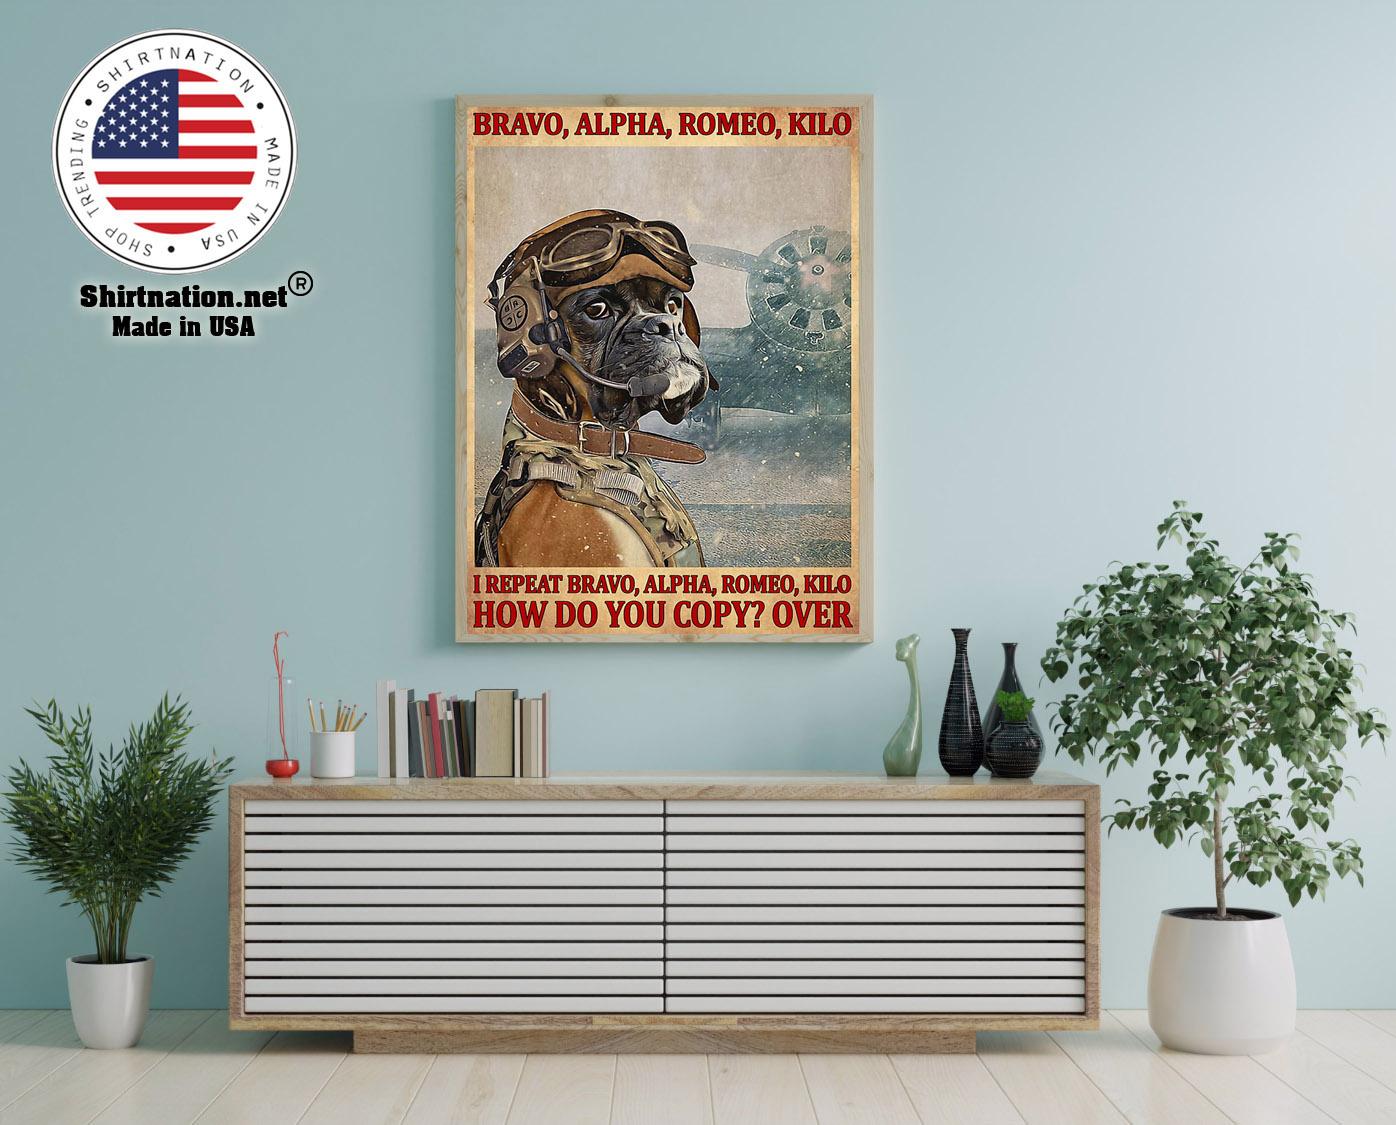 Bravo alpha romeo kilo I repeat bravo alpha romeo kilo how do you copy over poster 12